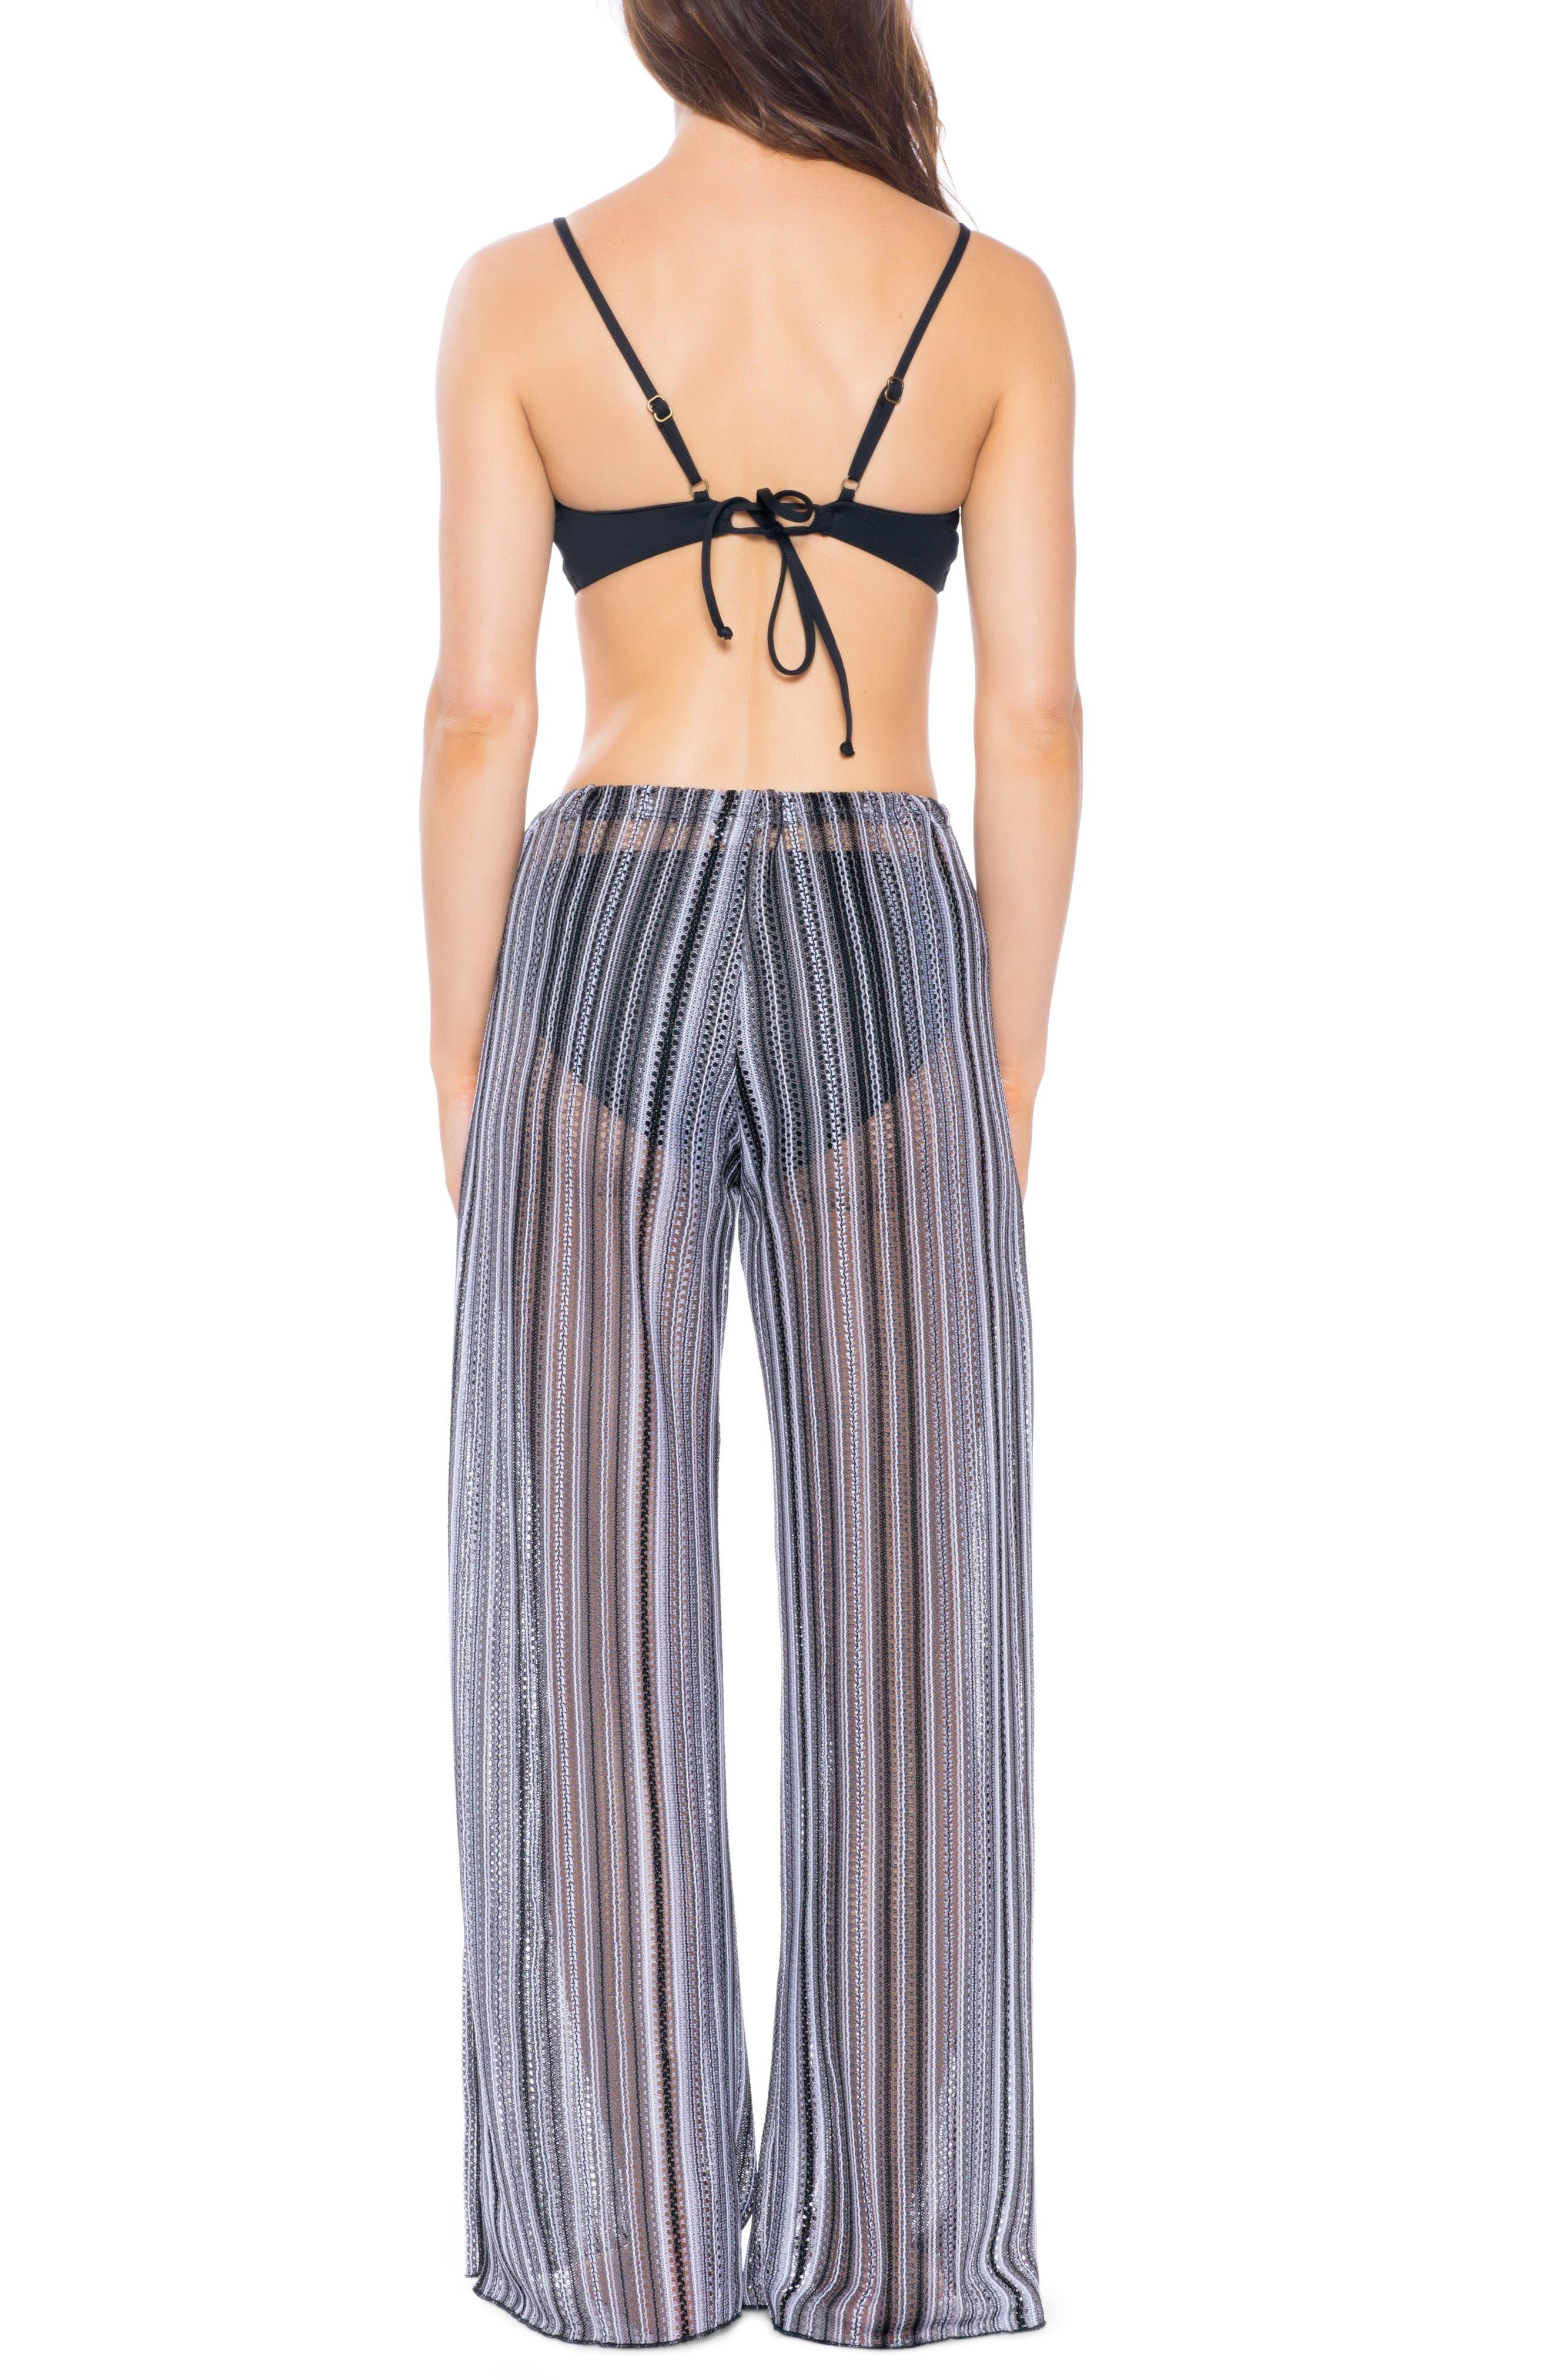 Pierside Cover-Up Flyaway Pants,                             Alternate thumbnail 2, color,                             BLACK